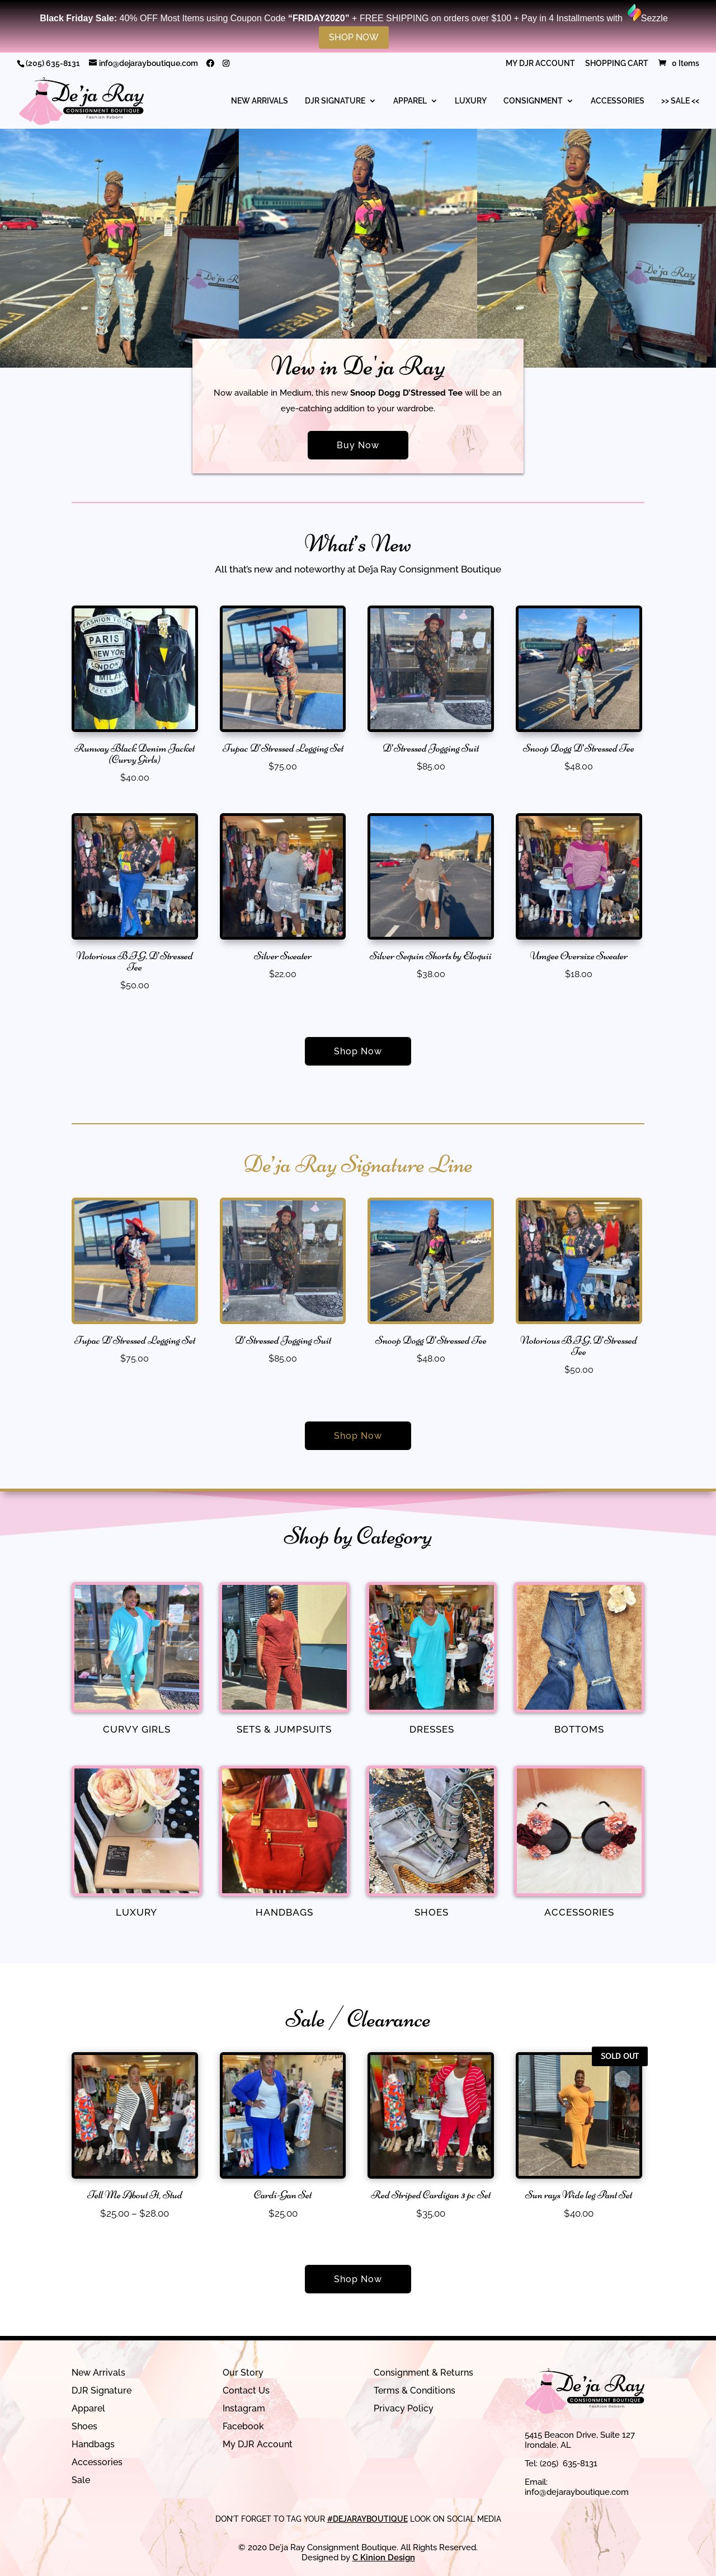 Birmingham-Web-Design-Agency-C-Kinion-Design - De'ja-Ray-Consignment-Boutique - full page